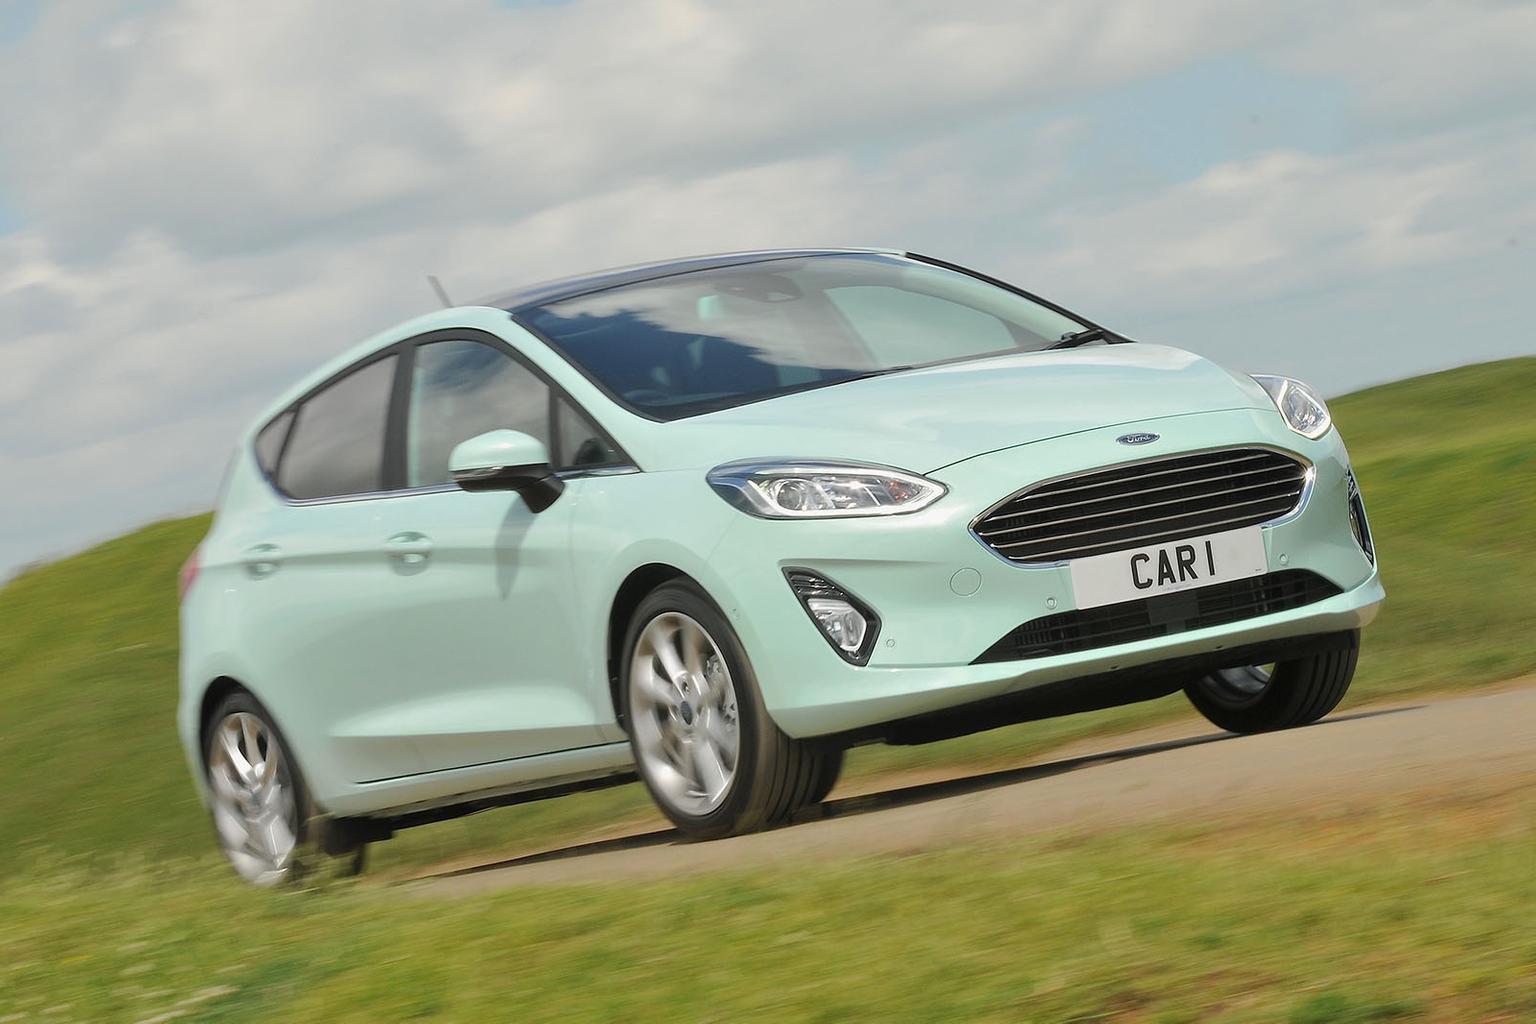 New Ford Fiesta & Seat Ibiza vs Skoda Fabia